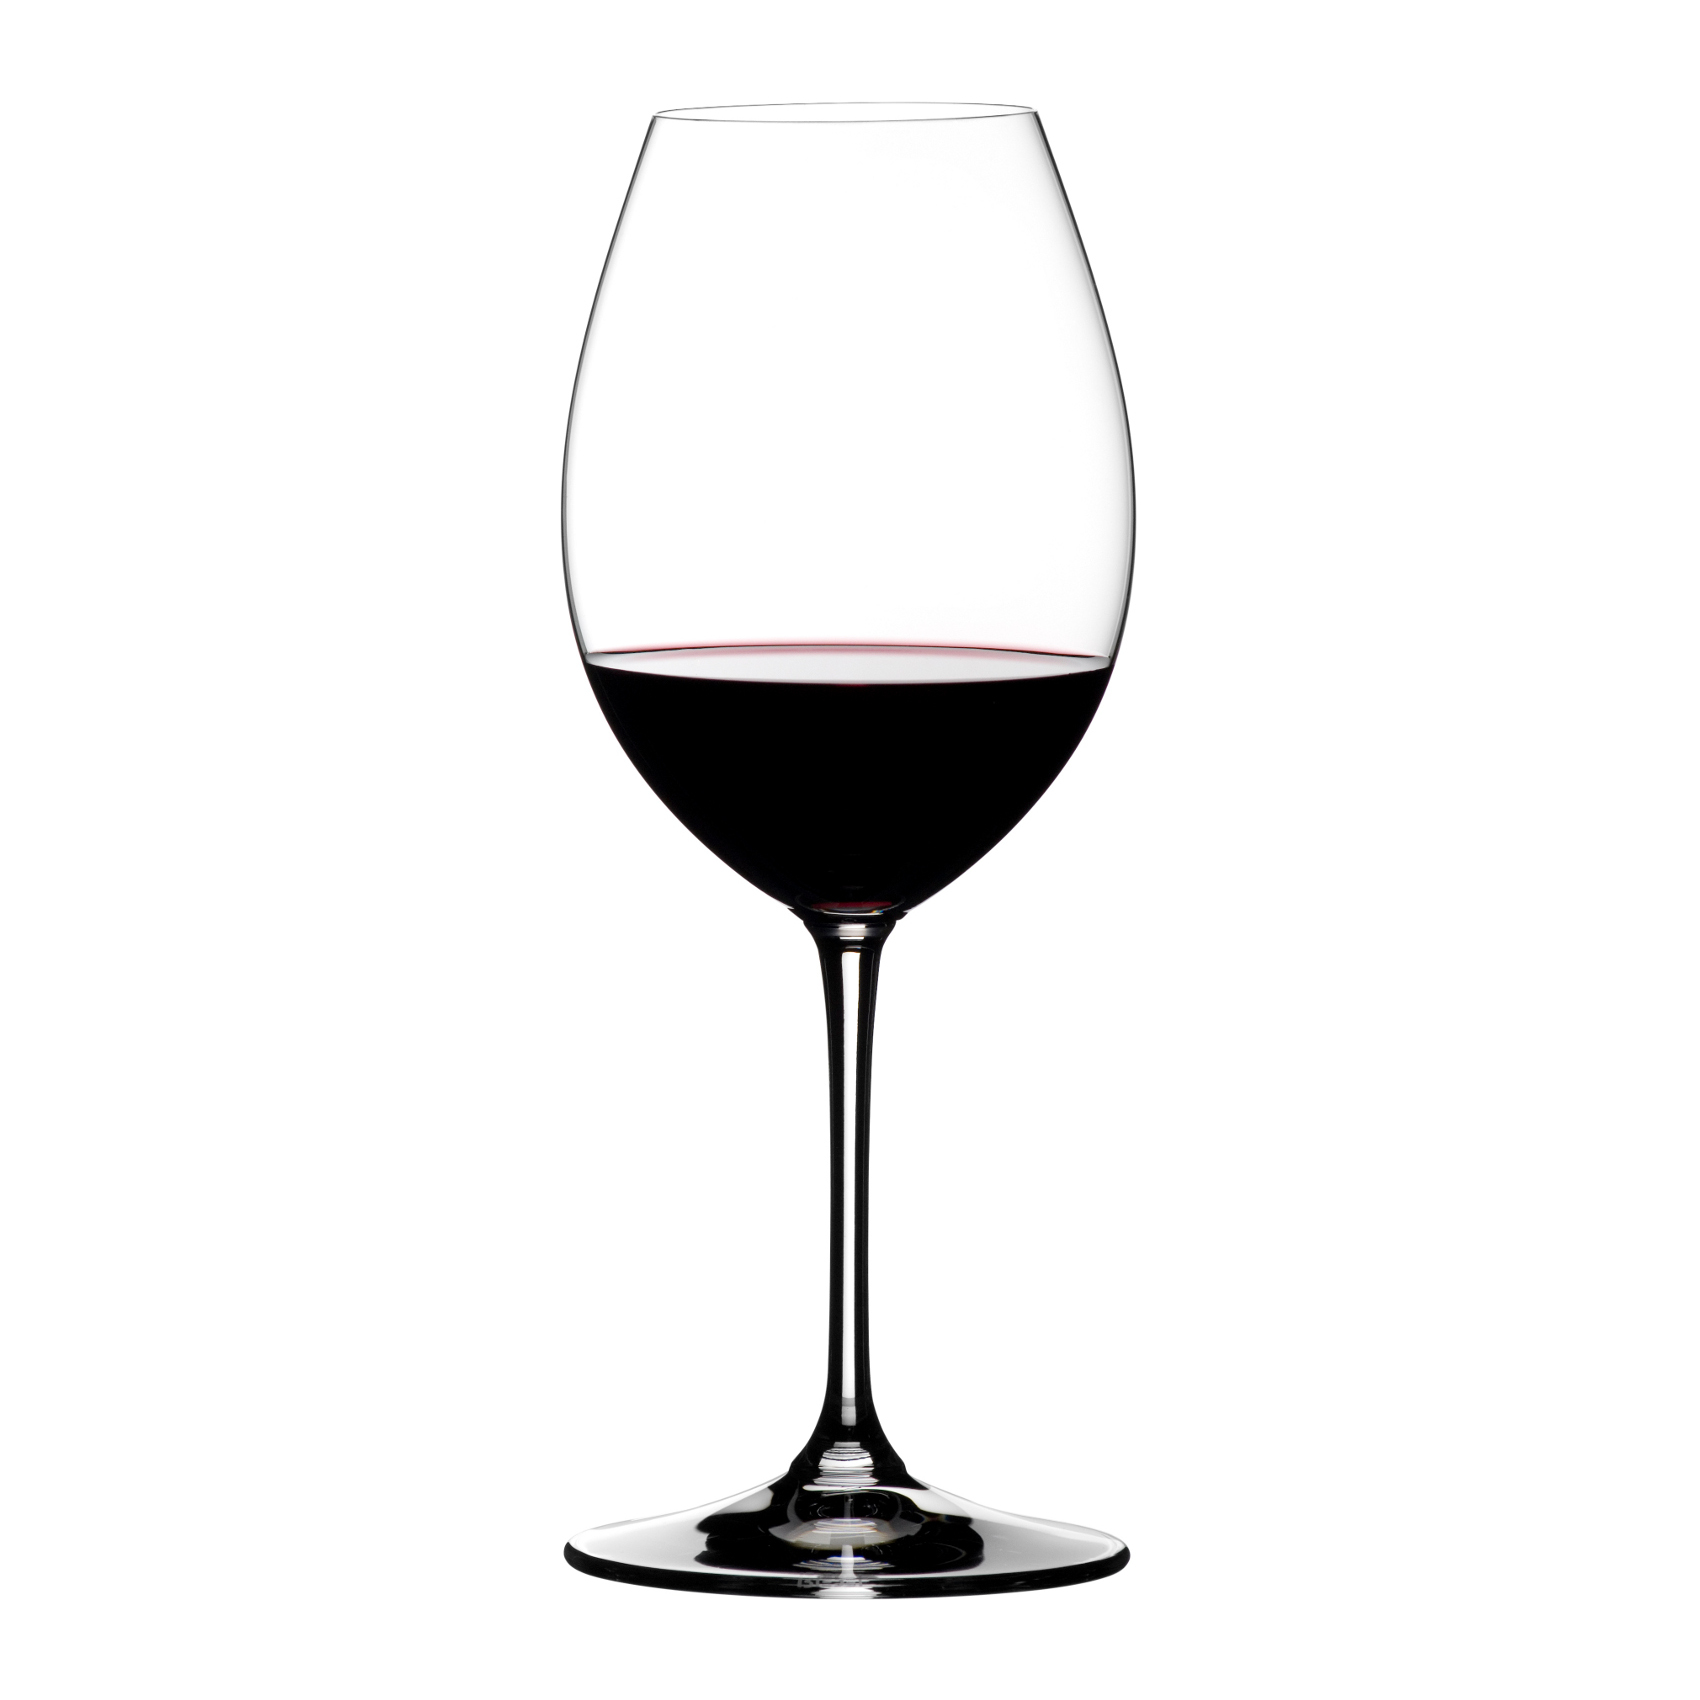 Riedel Vinum XL Leaded Crystal Syrah Glass, Buy 3 Get 4